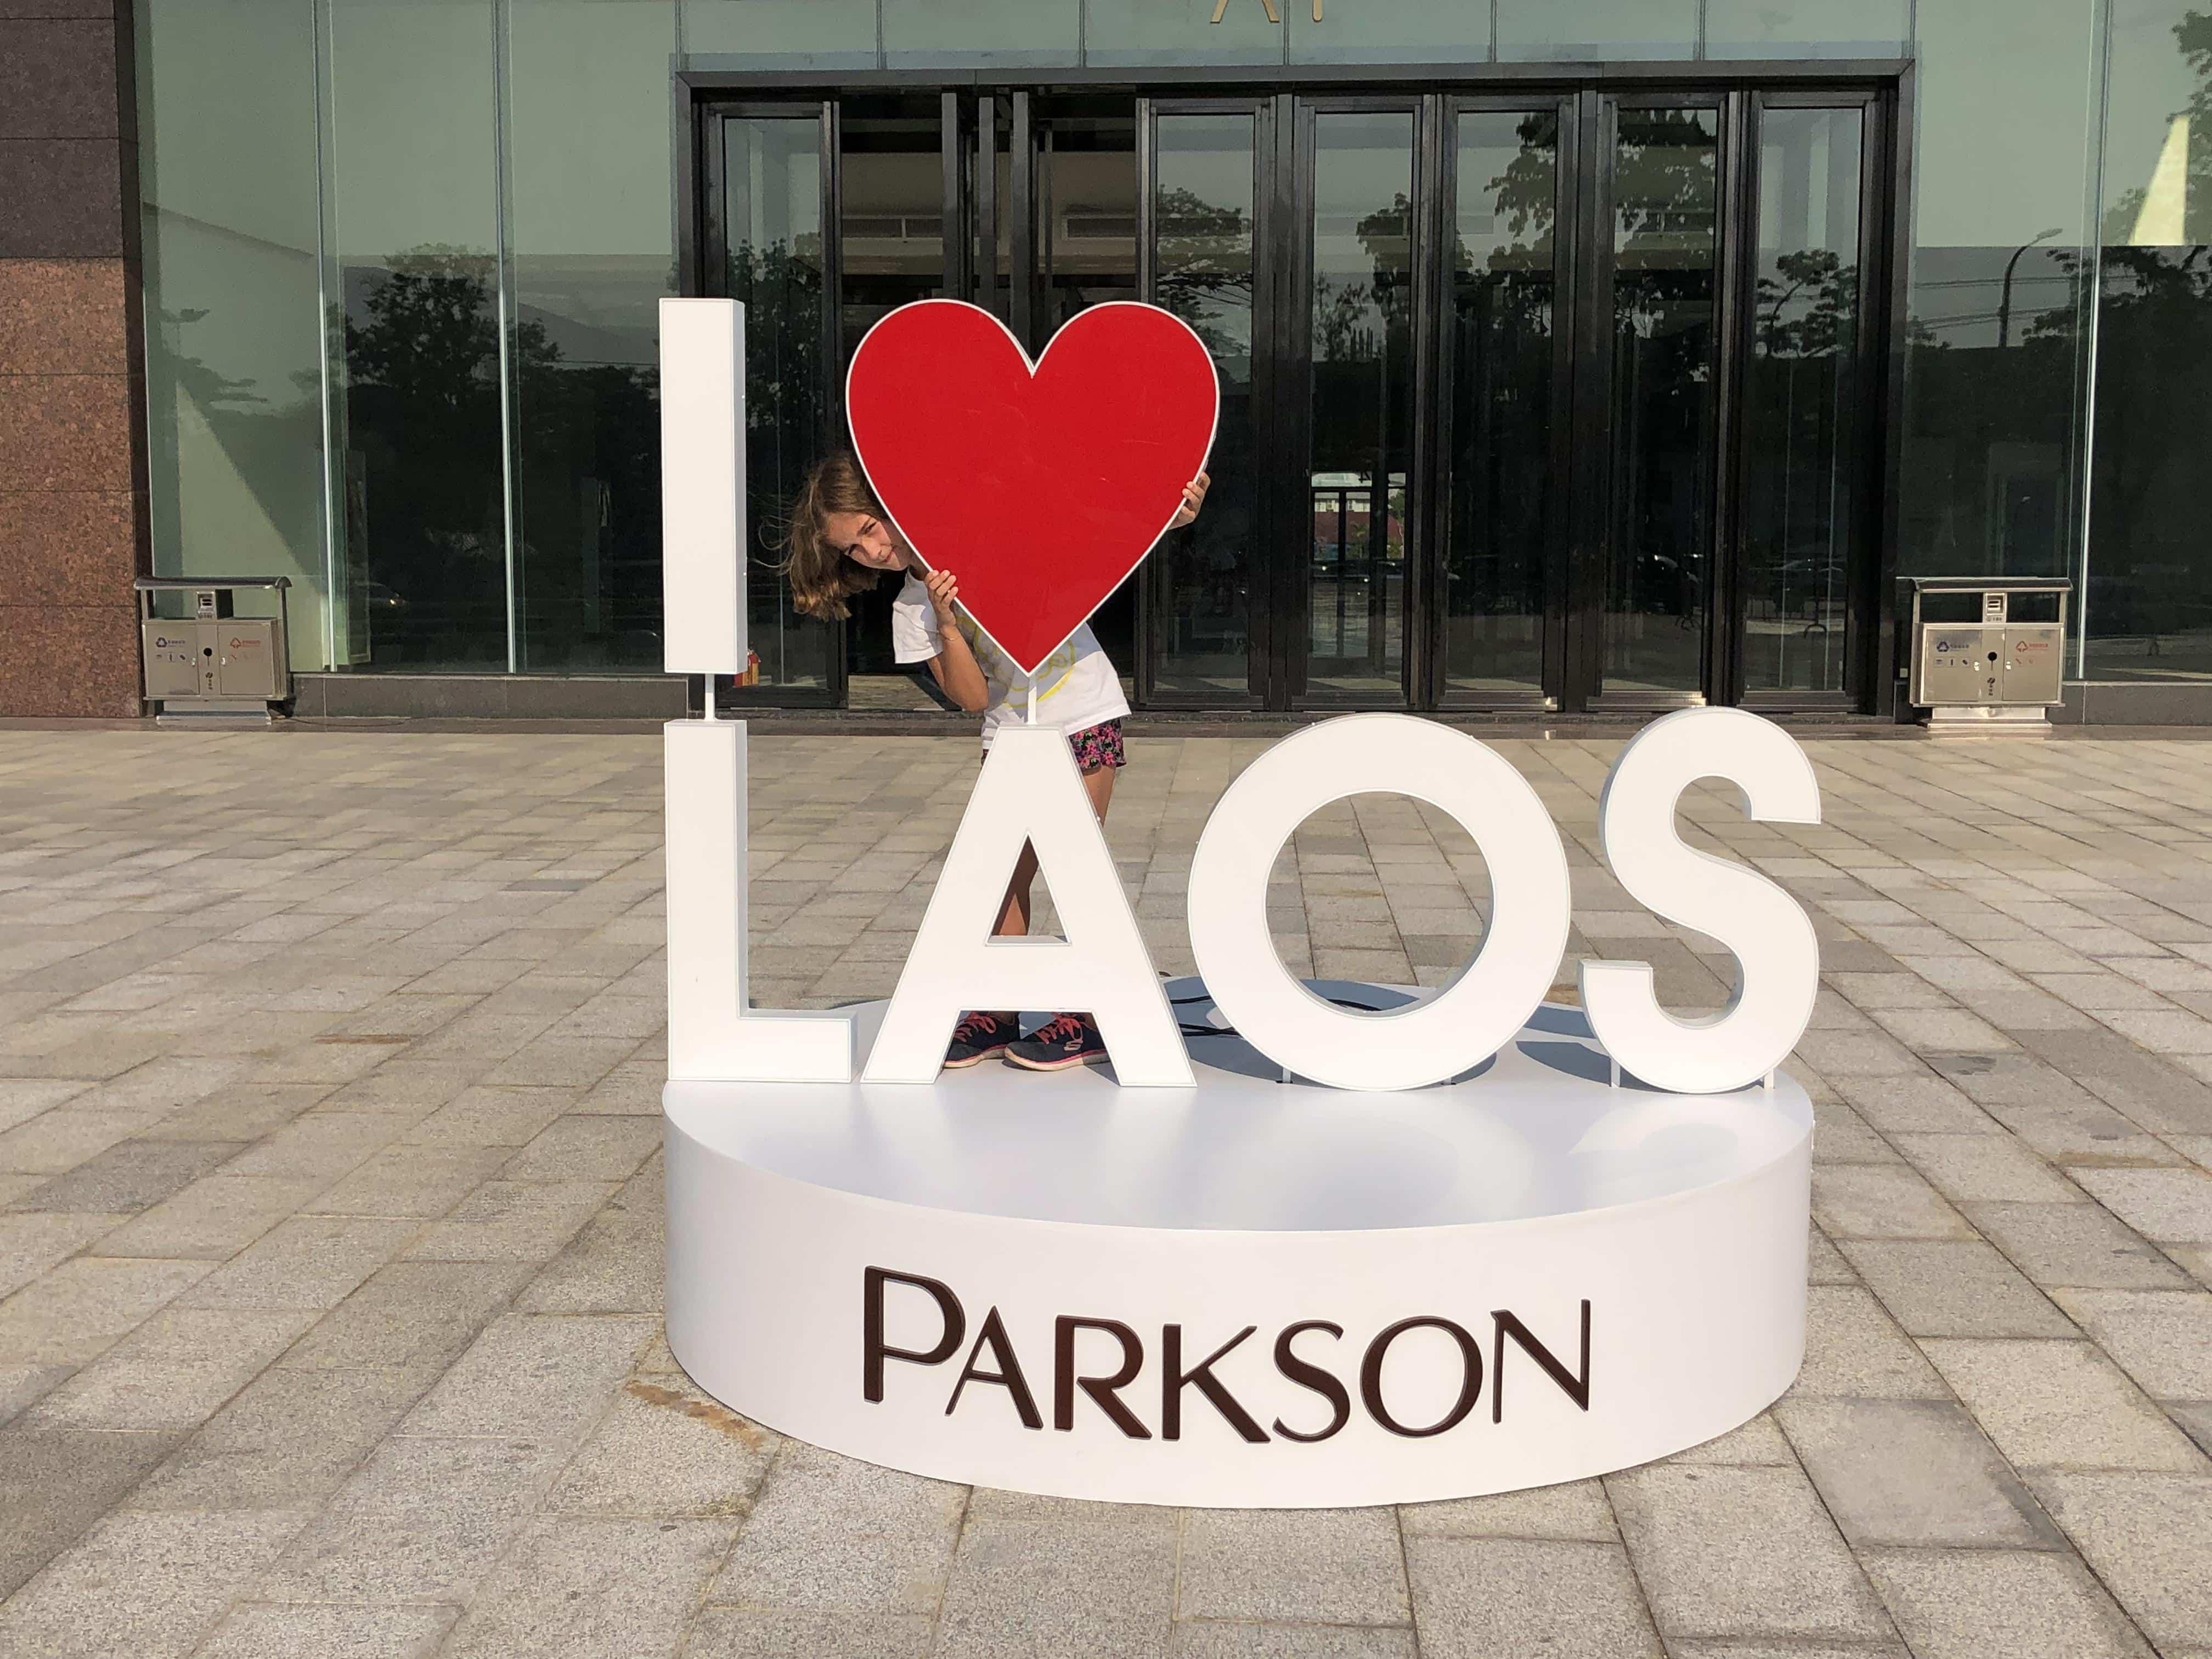 I heart Laos